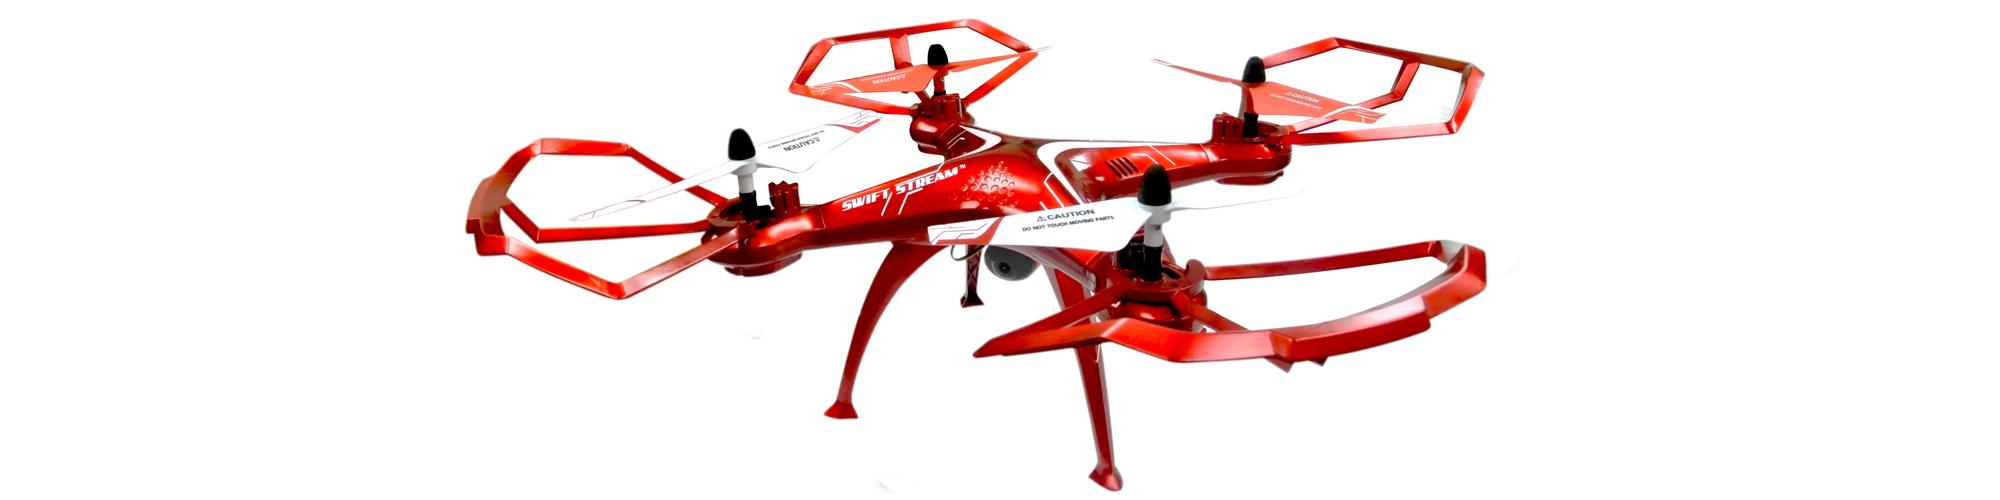 Z-10 Camera Drone